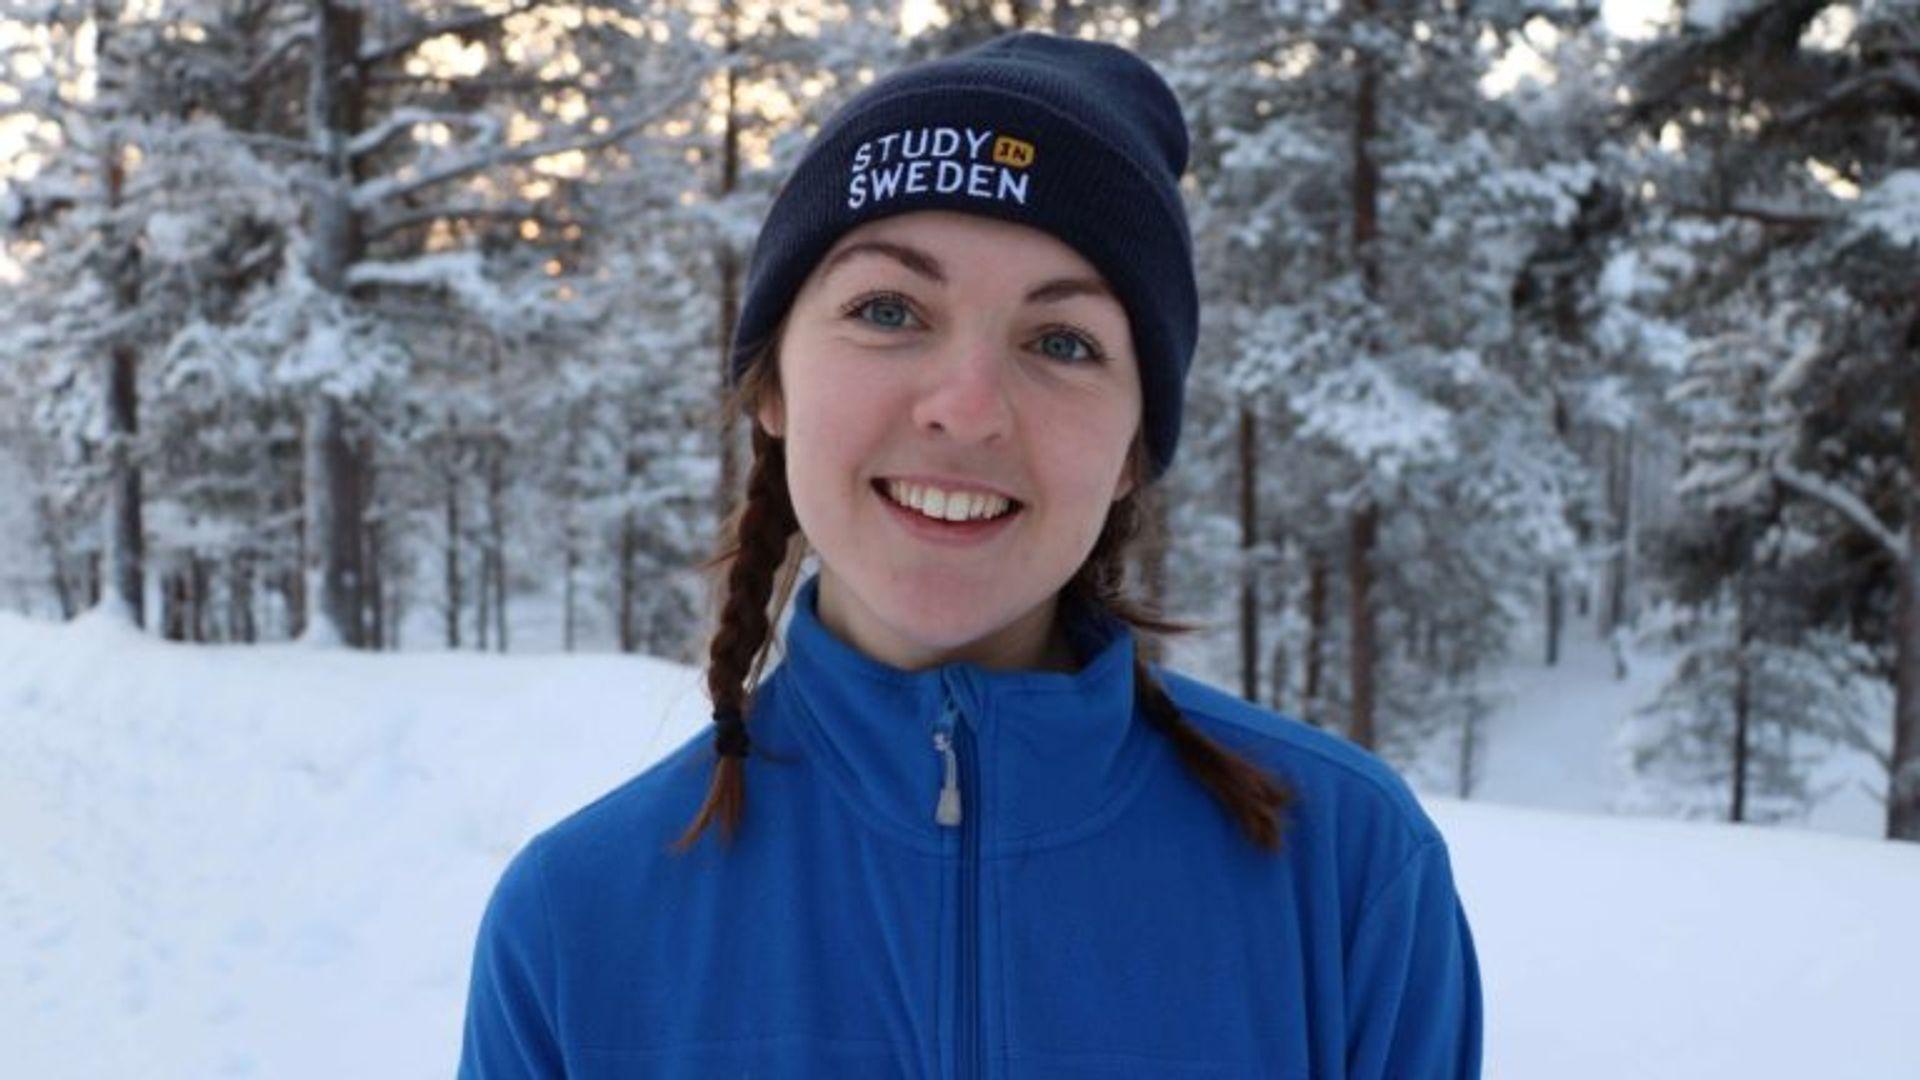 Emma enjoys her first winter in Sweden while in Kiruna.